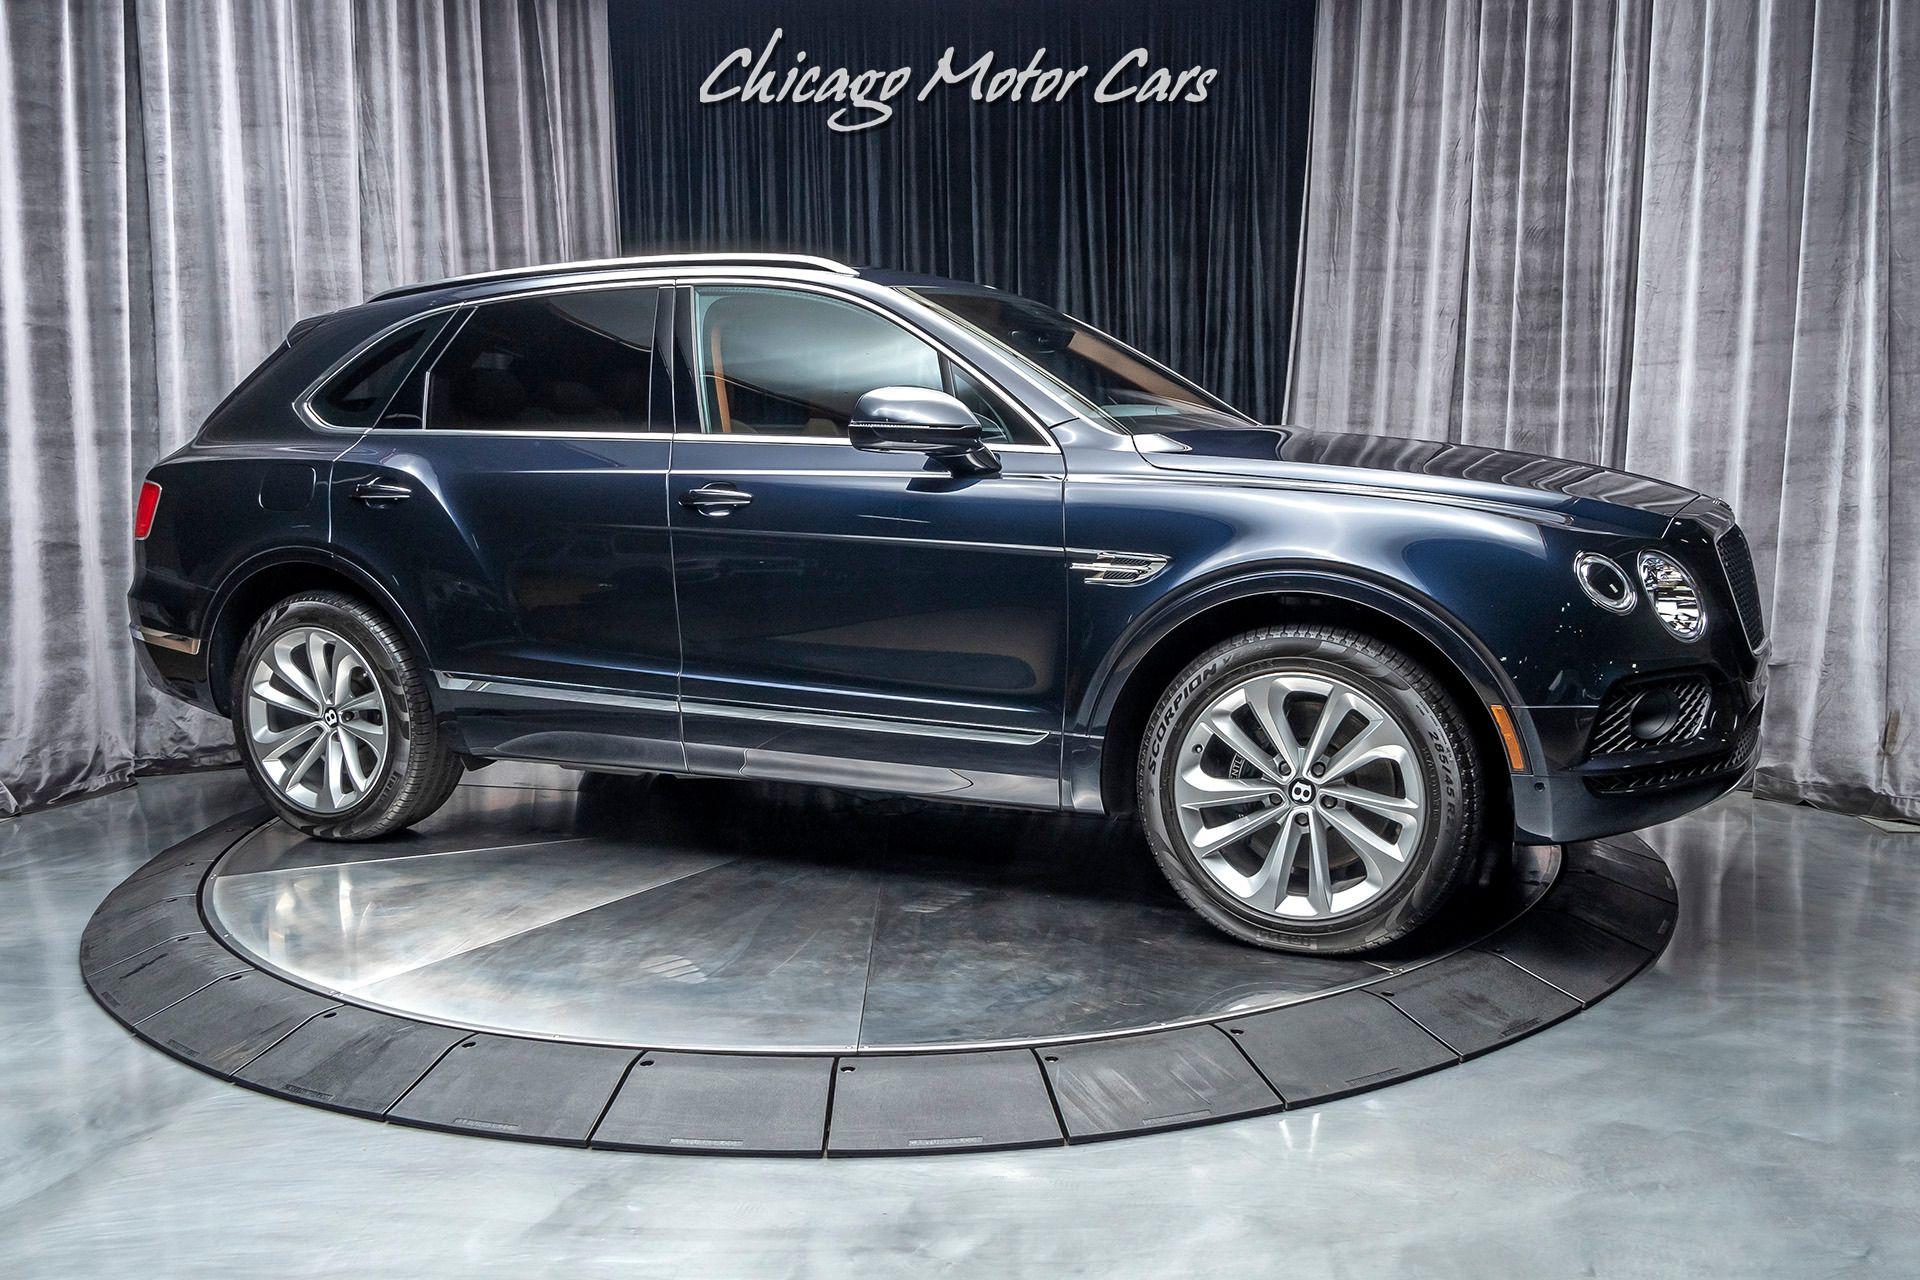 2019 Bentley Bentayga V8 Chicago Motor Cars United States For Sale On Luxurypulse Bentley Suv Bentley Luxury Suv